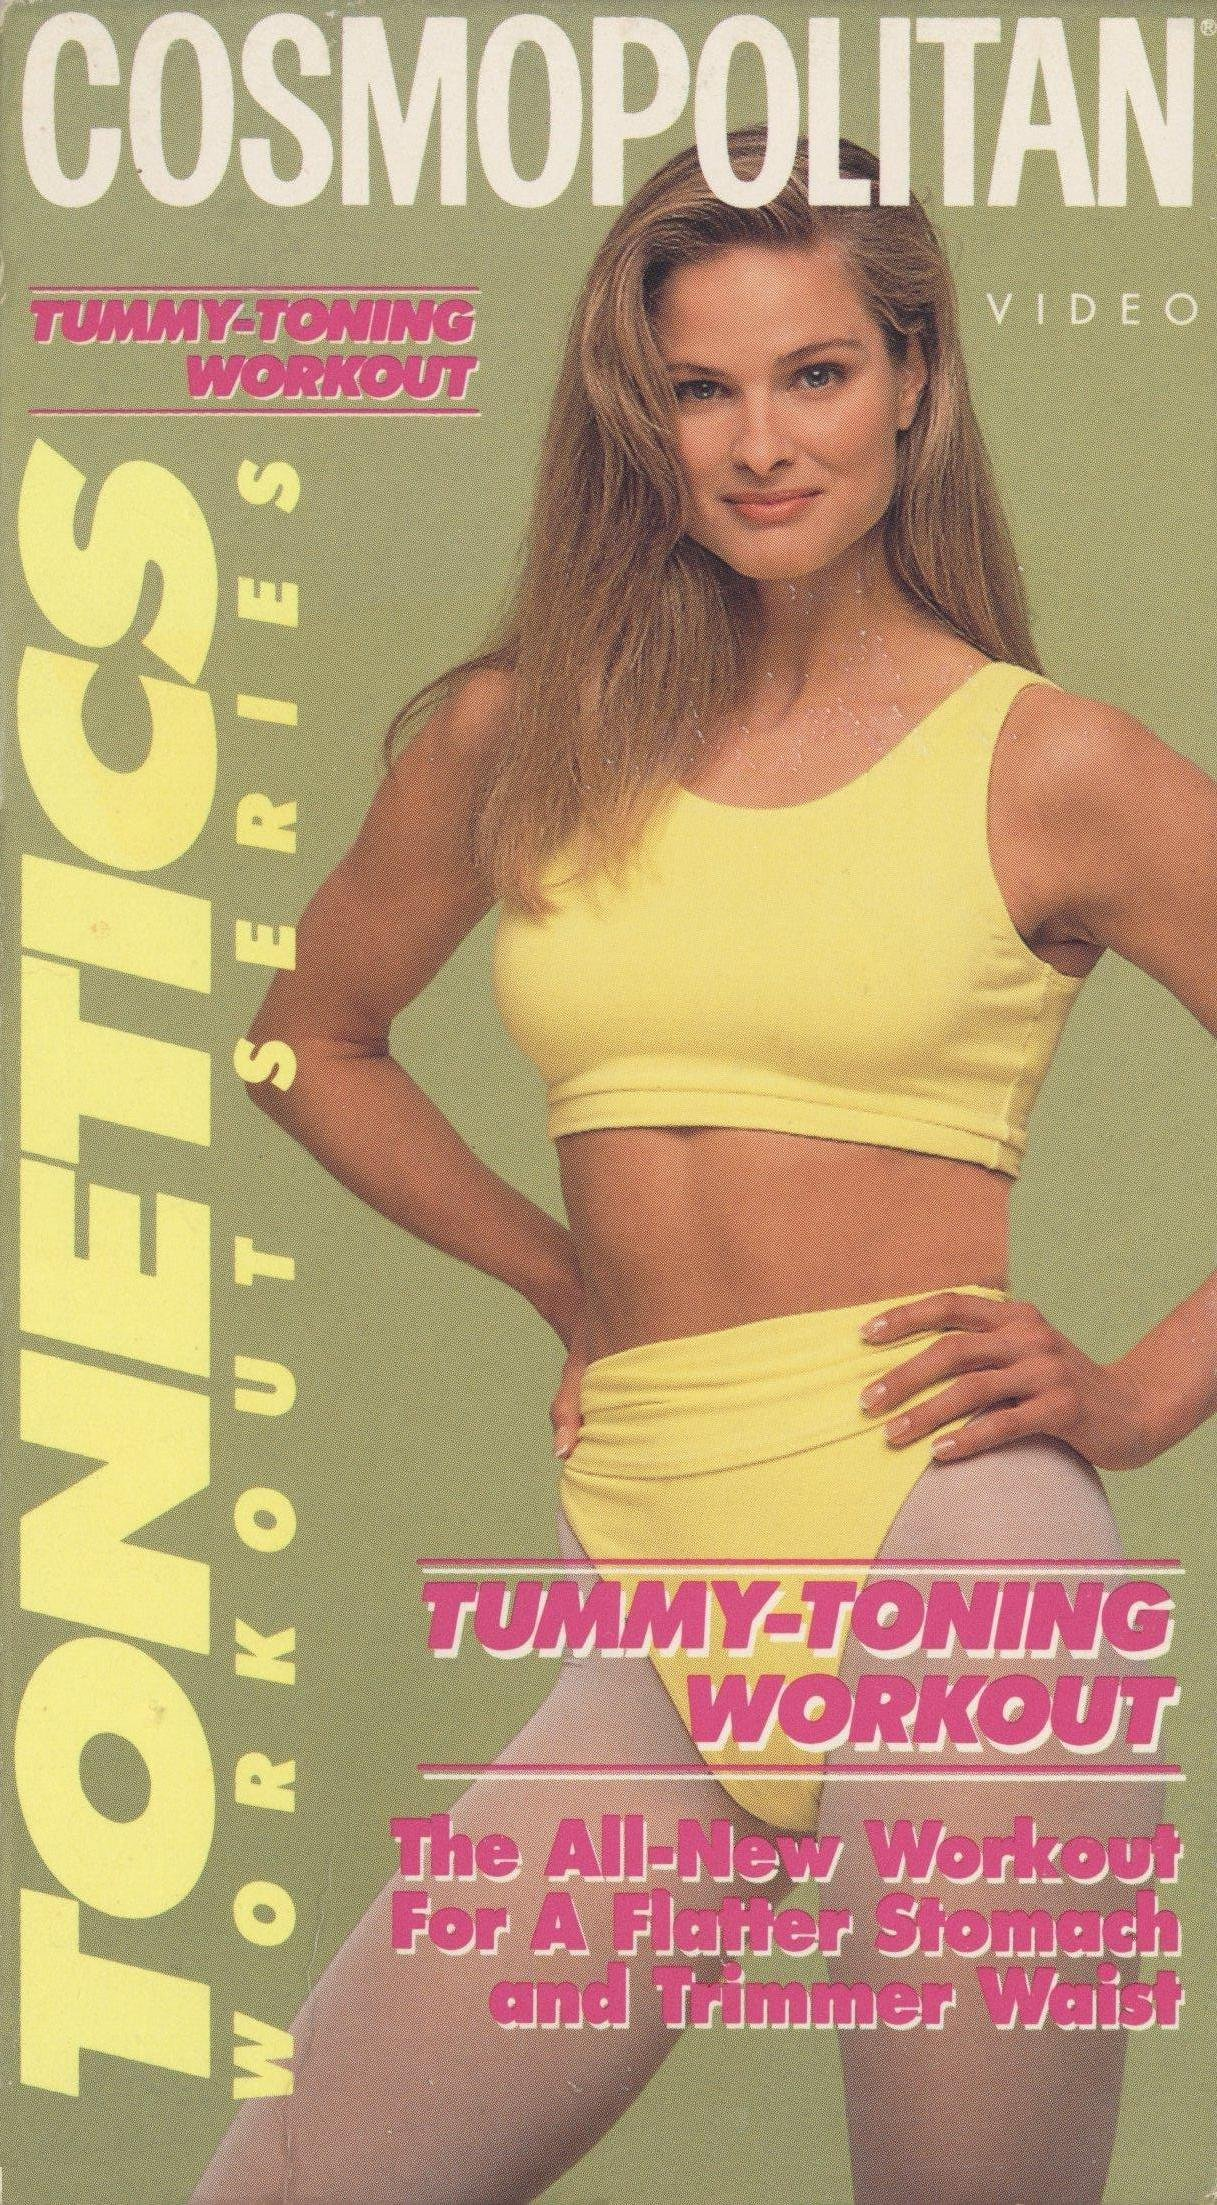 COSMOPOLITAN TONETICS WORKOUT SERIES: TUMMY TONING WORKOUT [VHS]